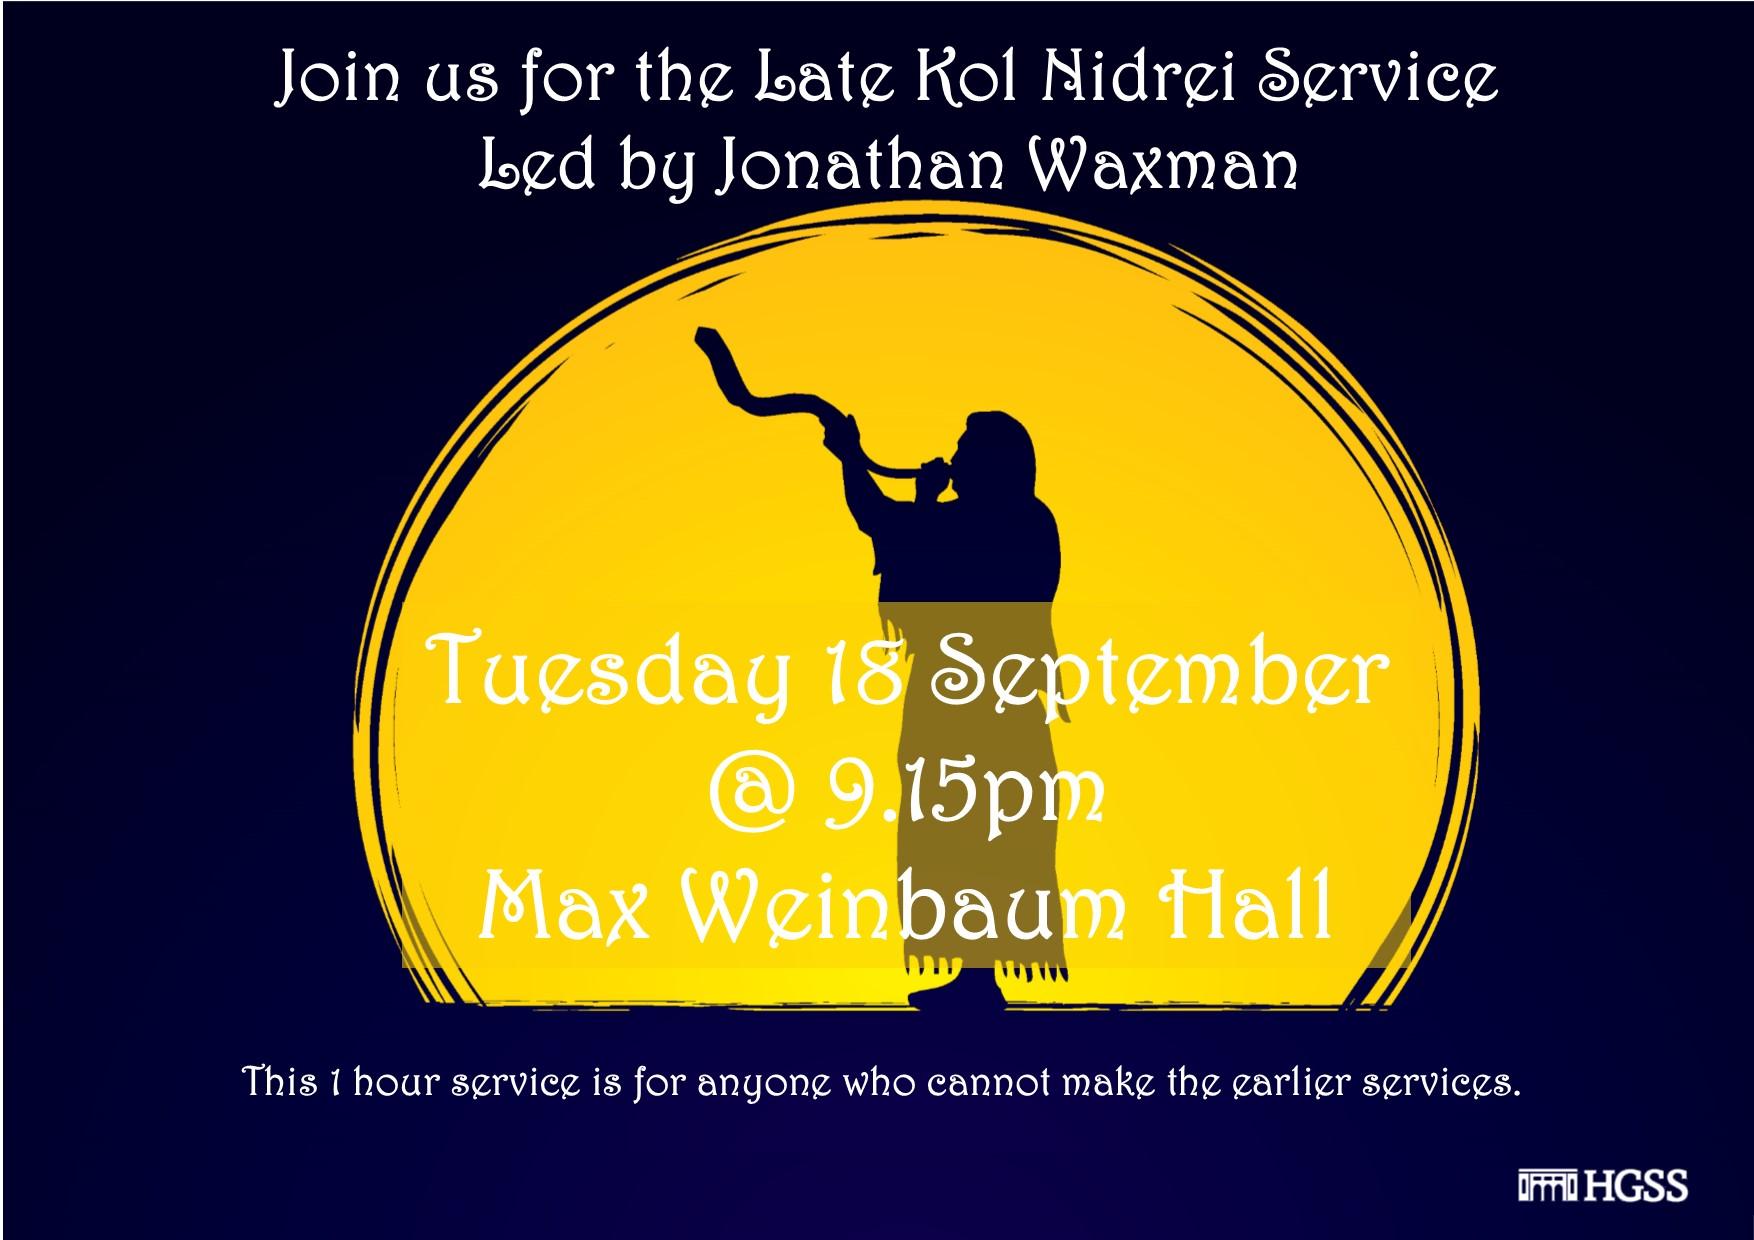 Late Kol Nidrei Service @ Max Weinbaum Hall